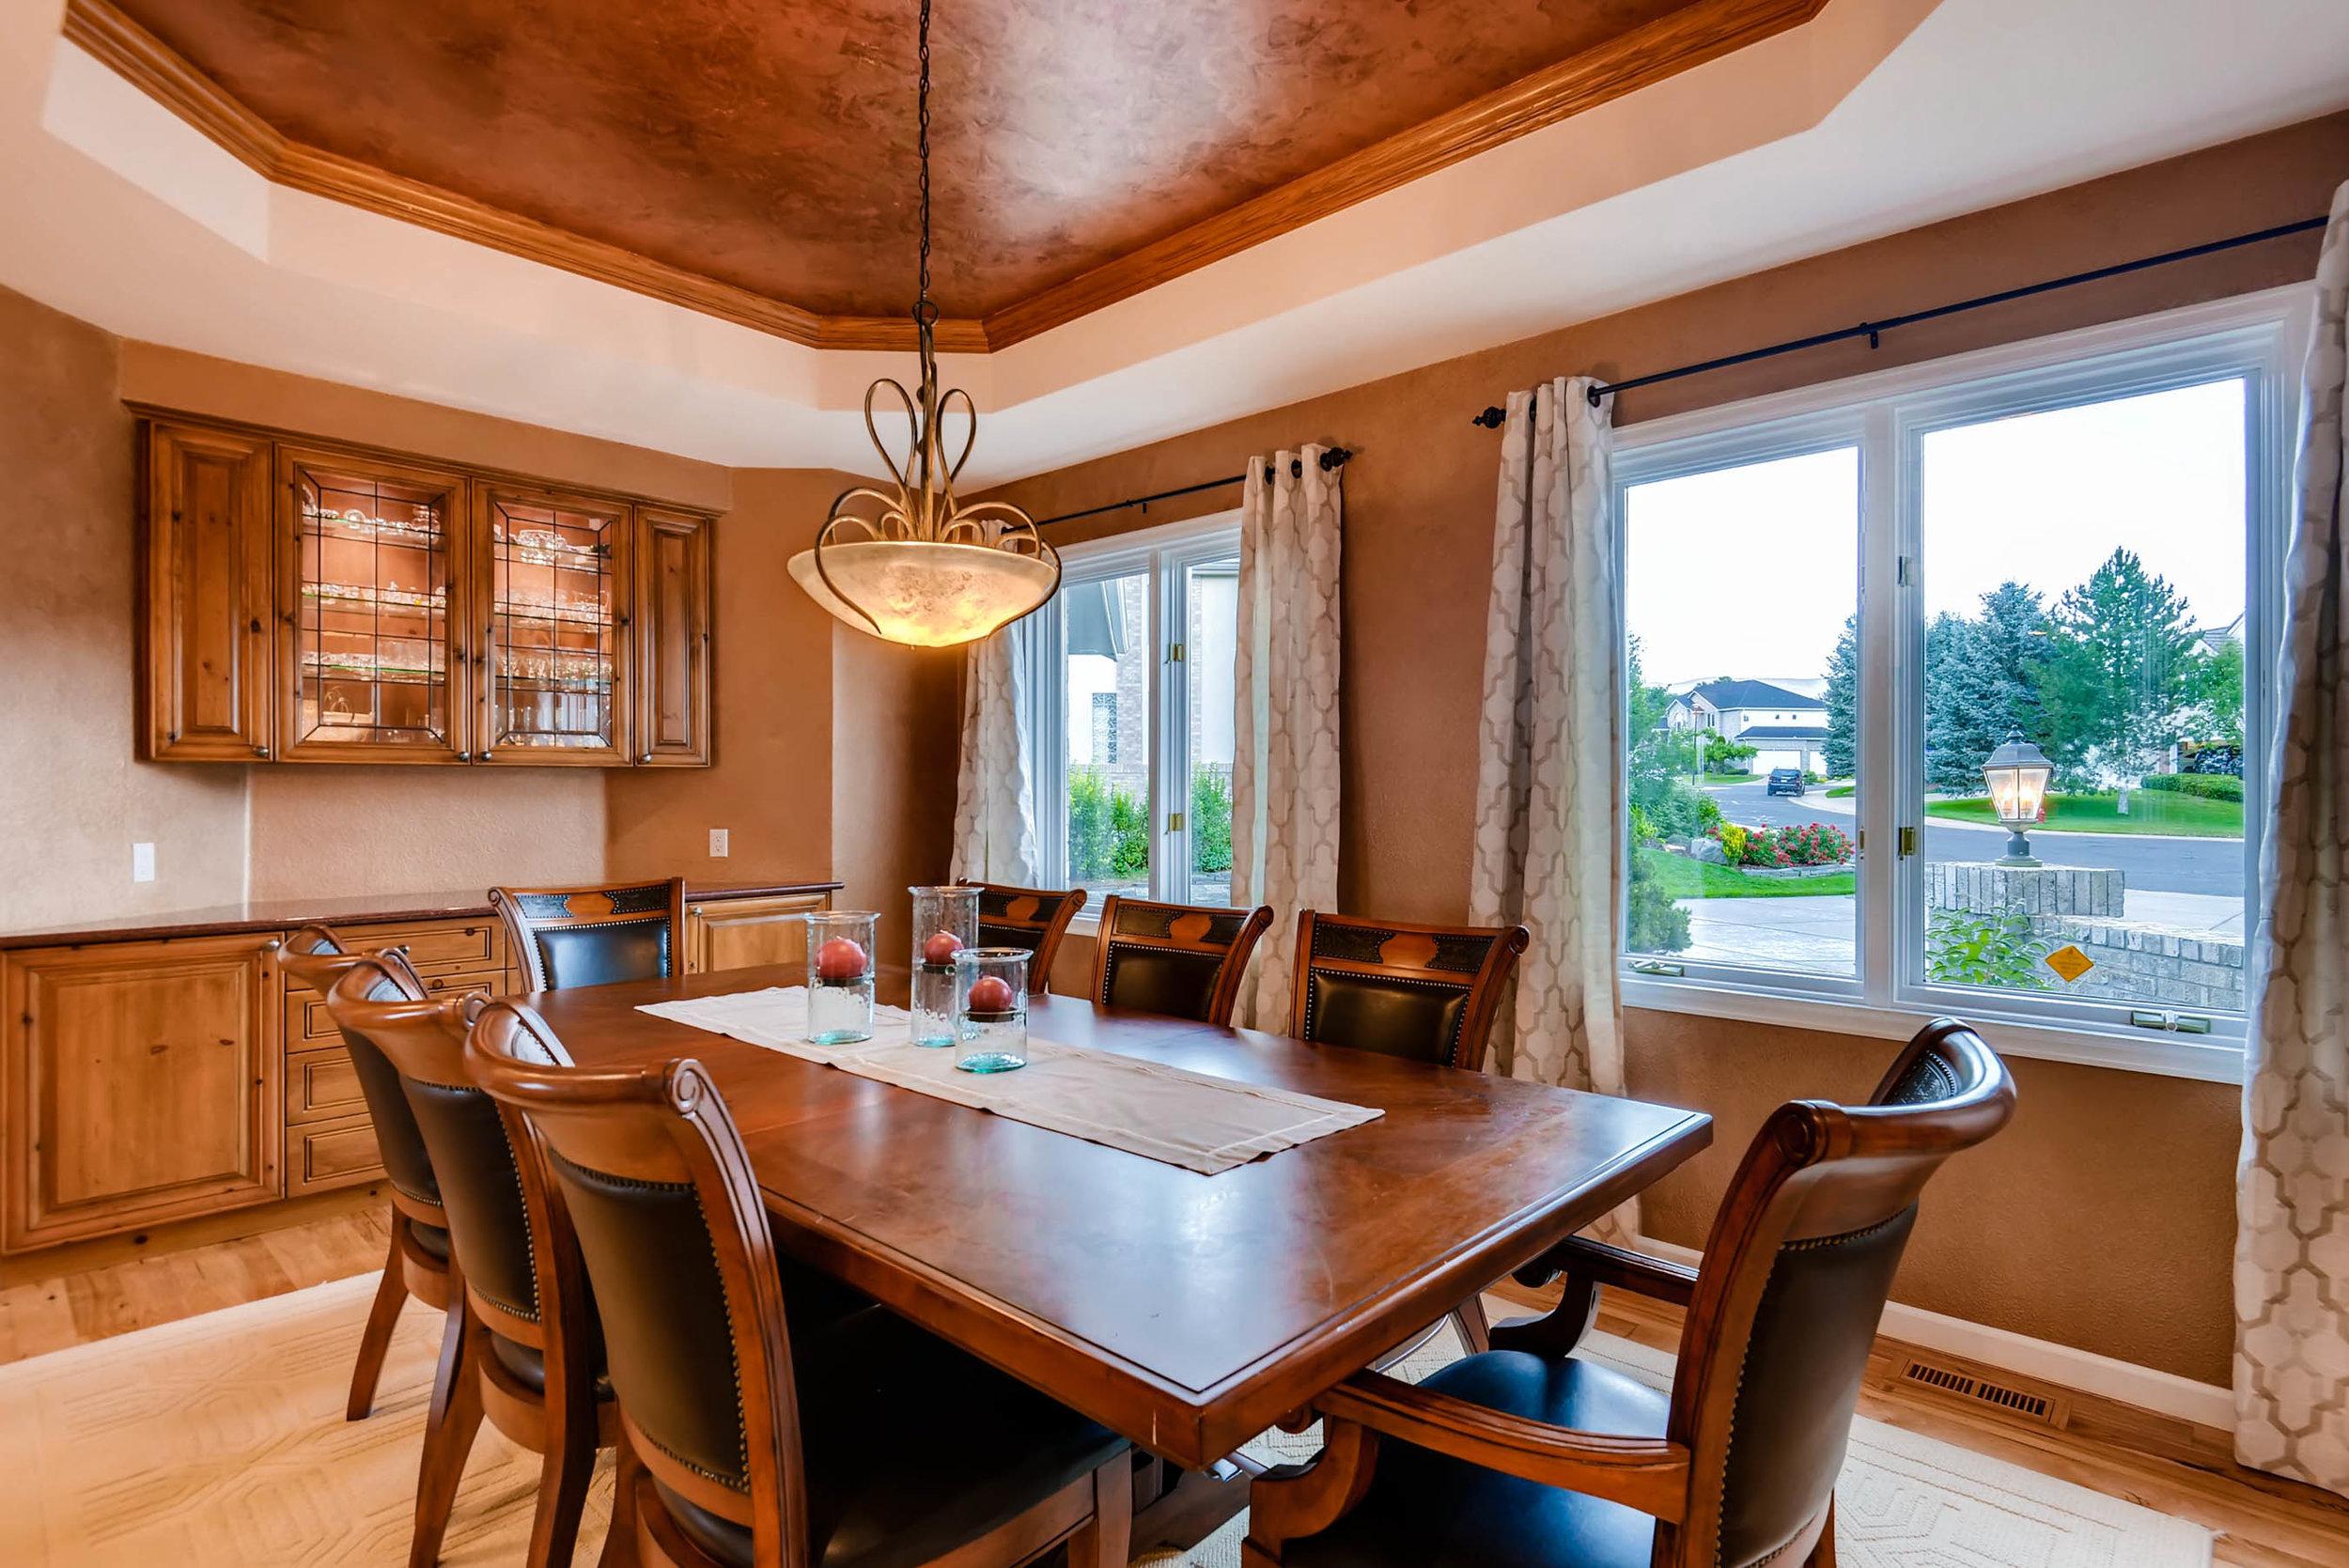 2449 S Yank Ct Lakewood CO-print-007-5-Dining Room-2700x1802-300dpi.jpg